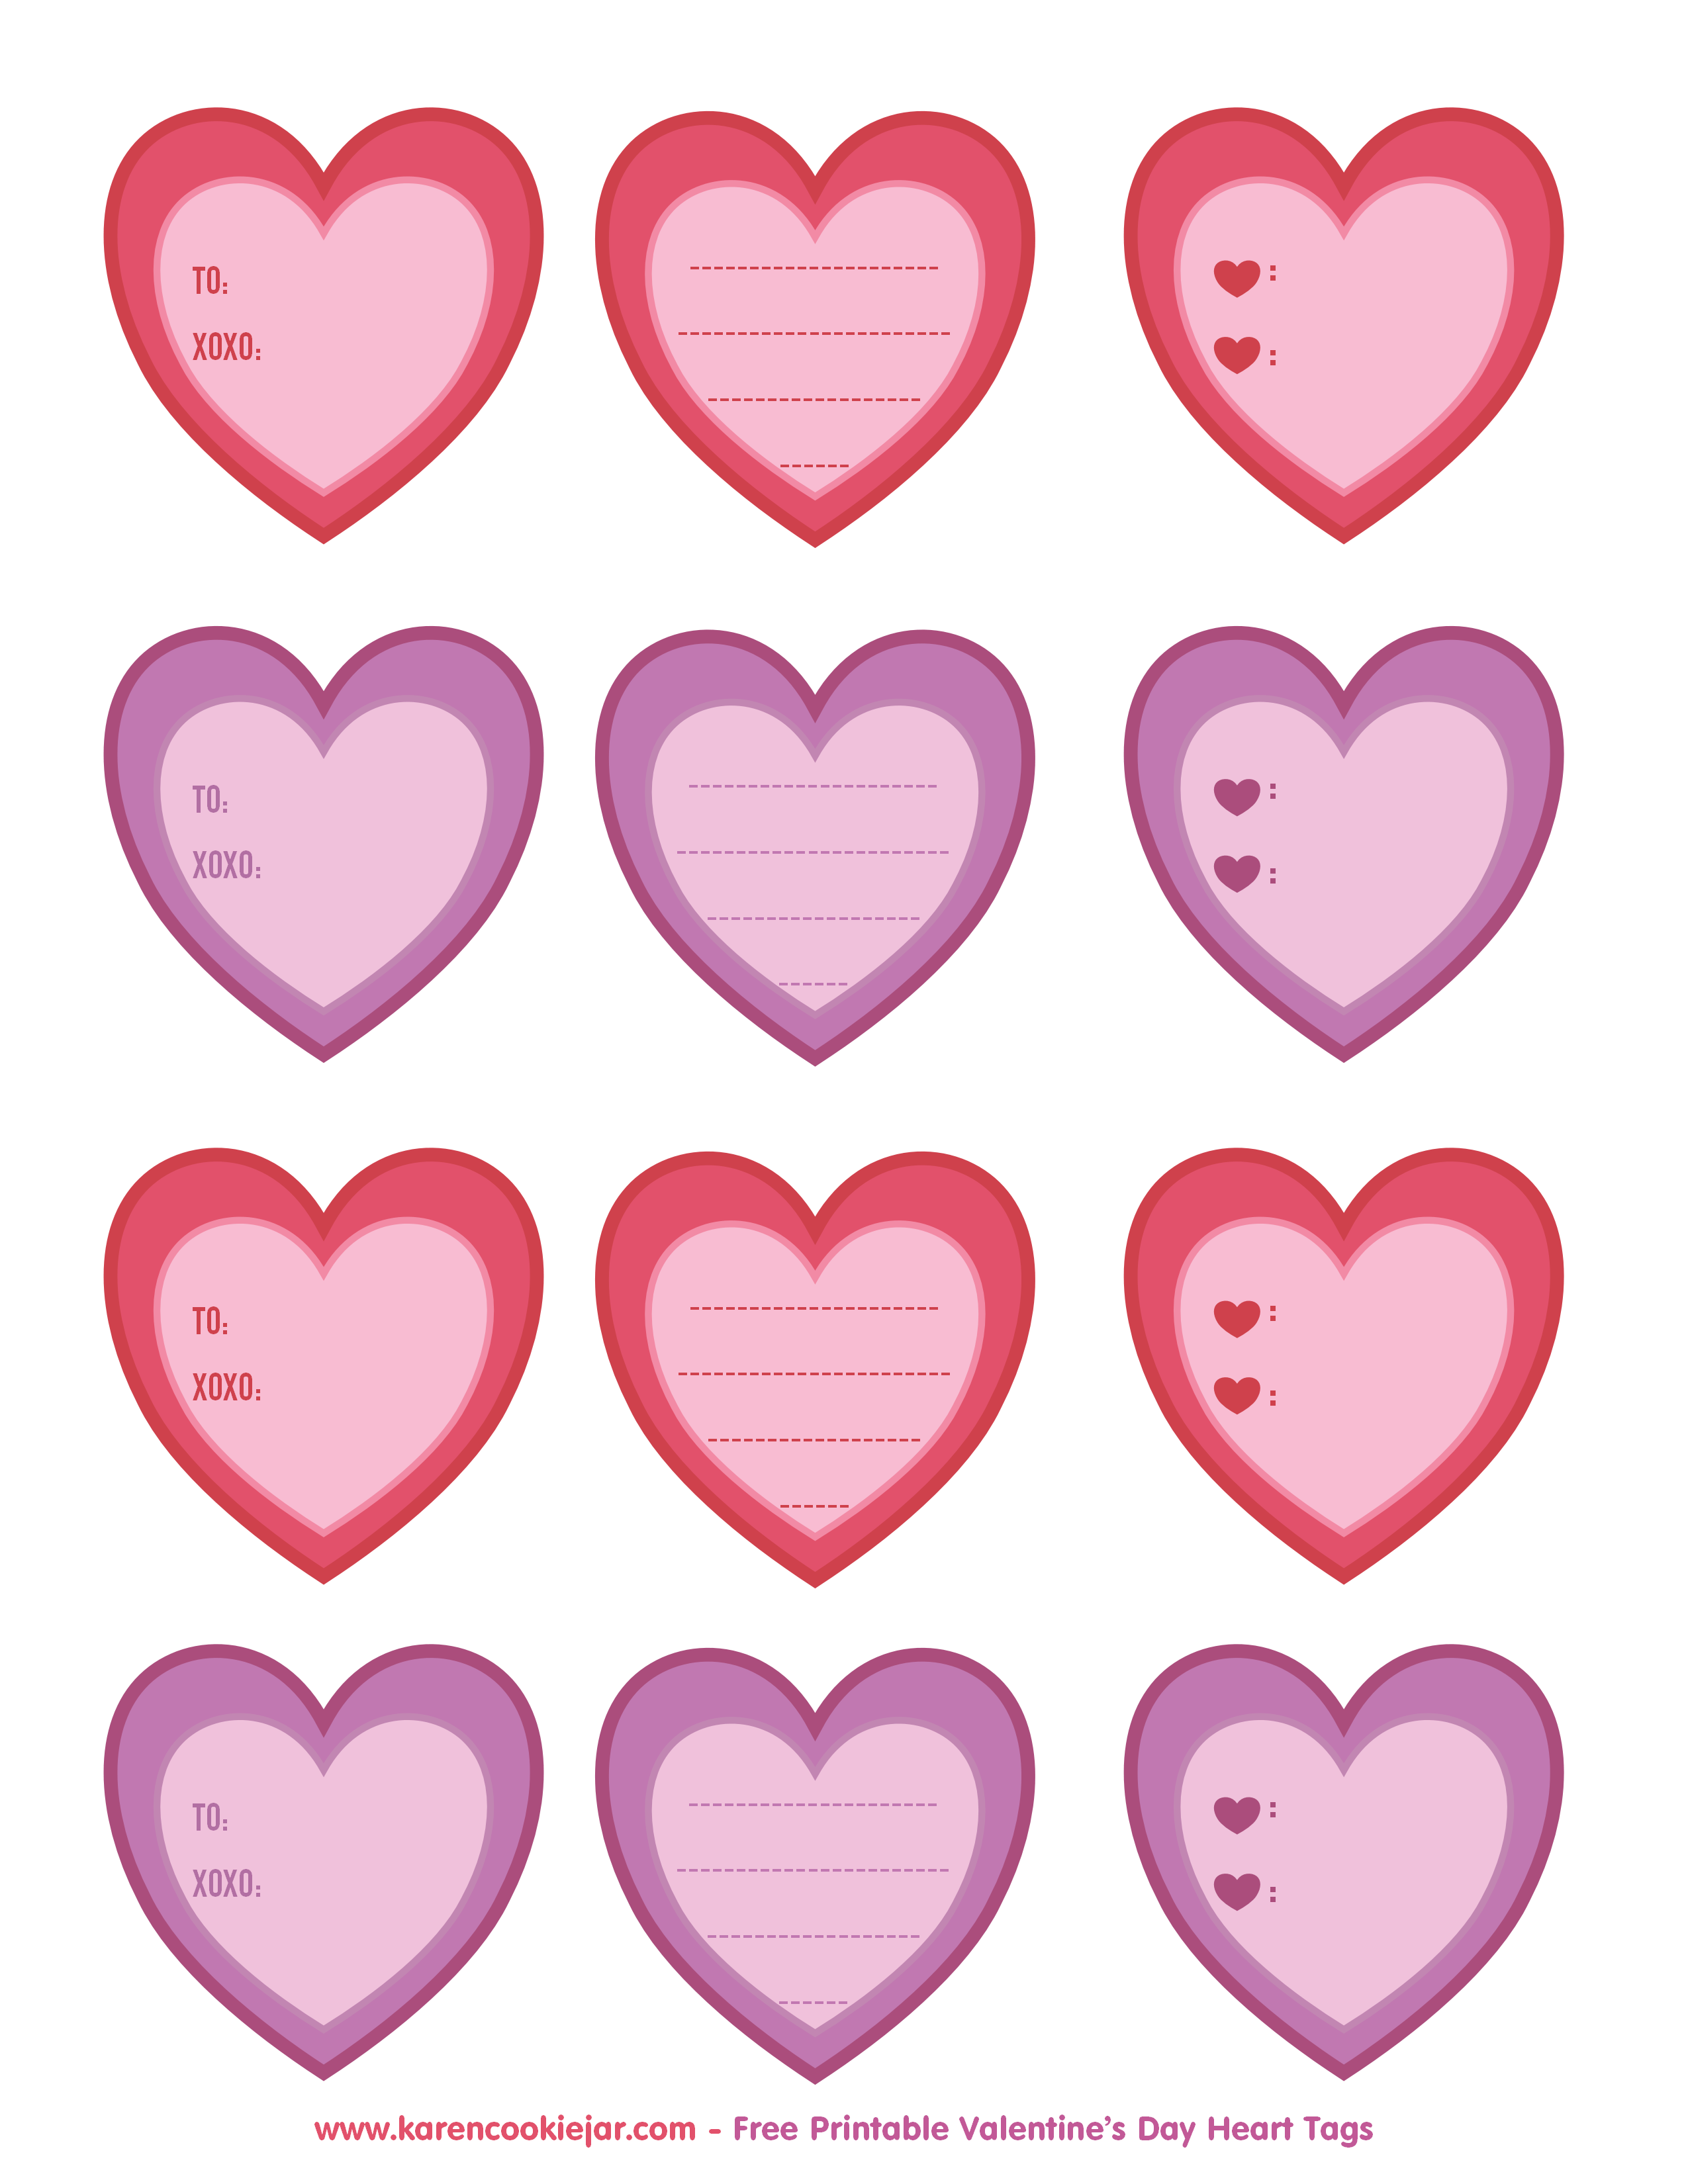 heart tags as clipart | VIÑETAS Y ETIQUETAS | Pinterest ...